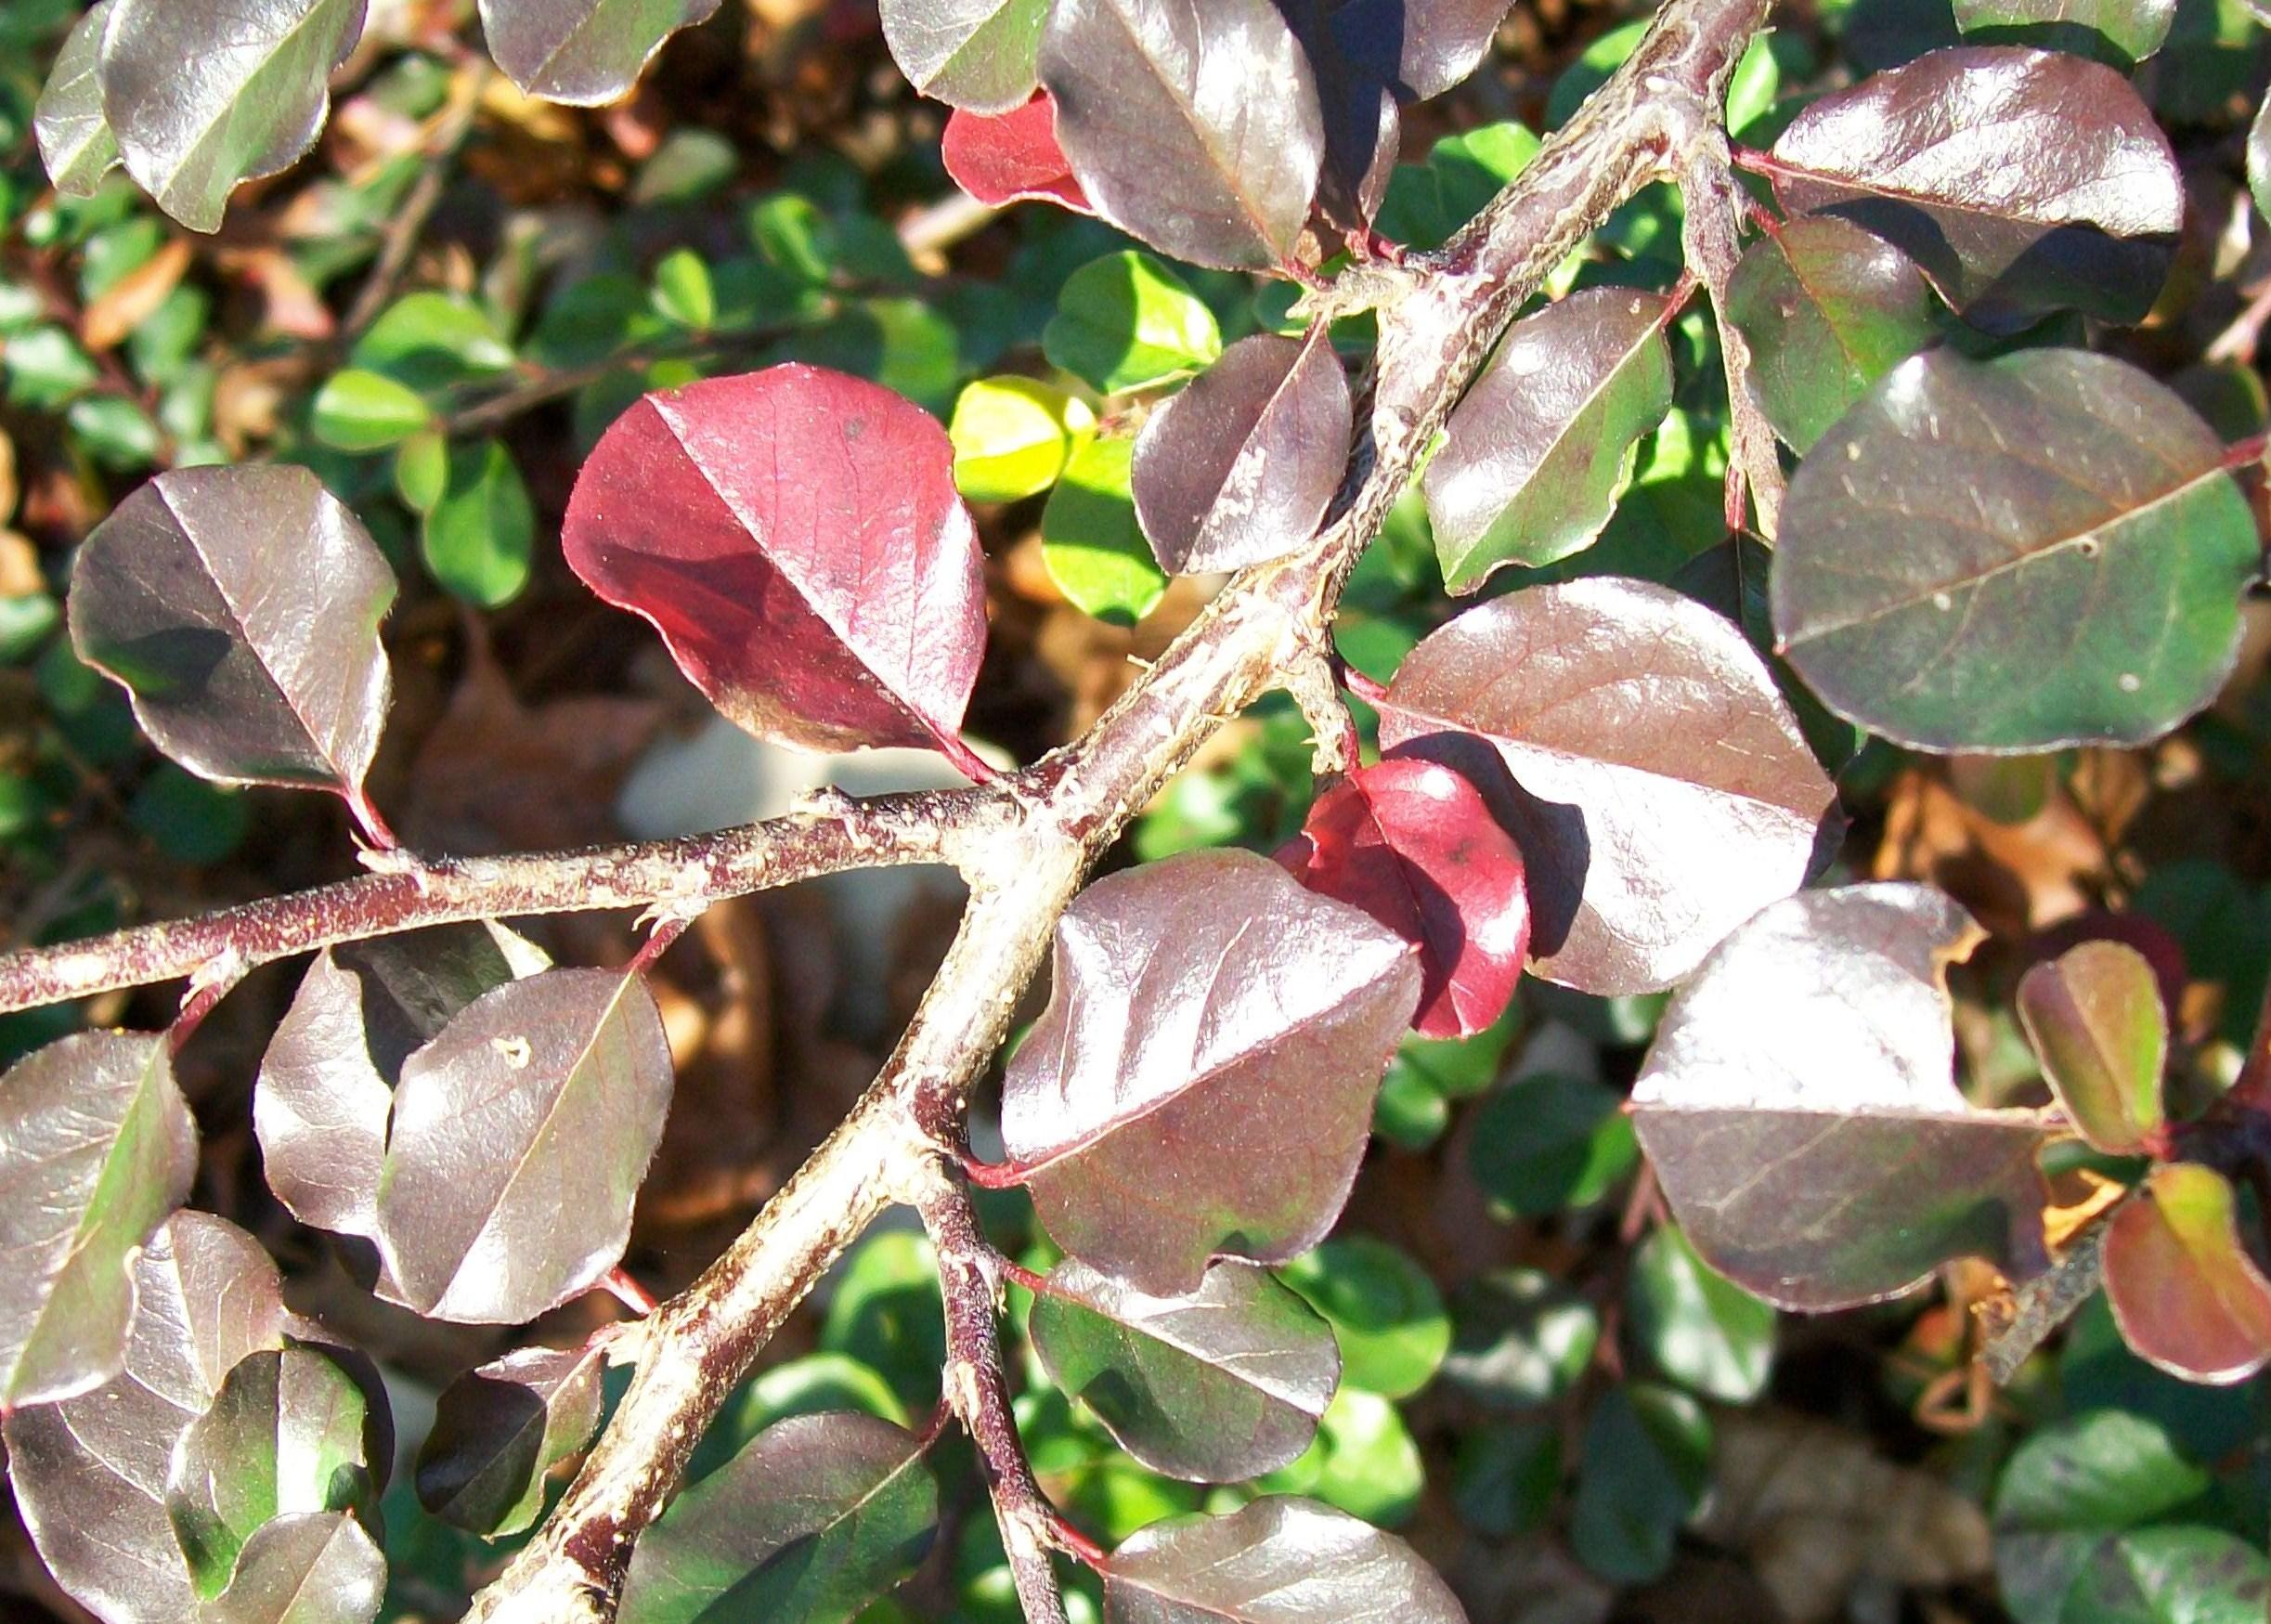 Cotoneaster apiculatus / Cotoneaster apiculatus